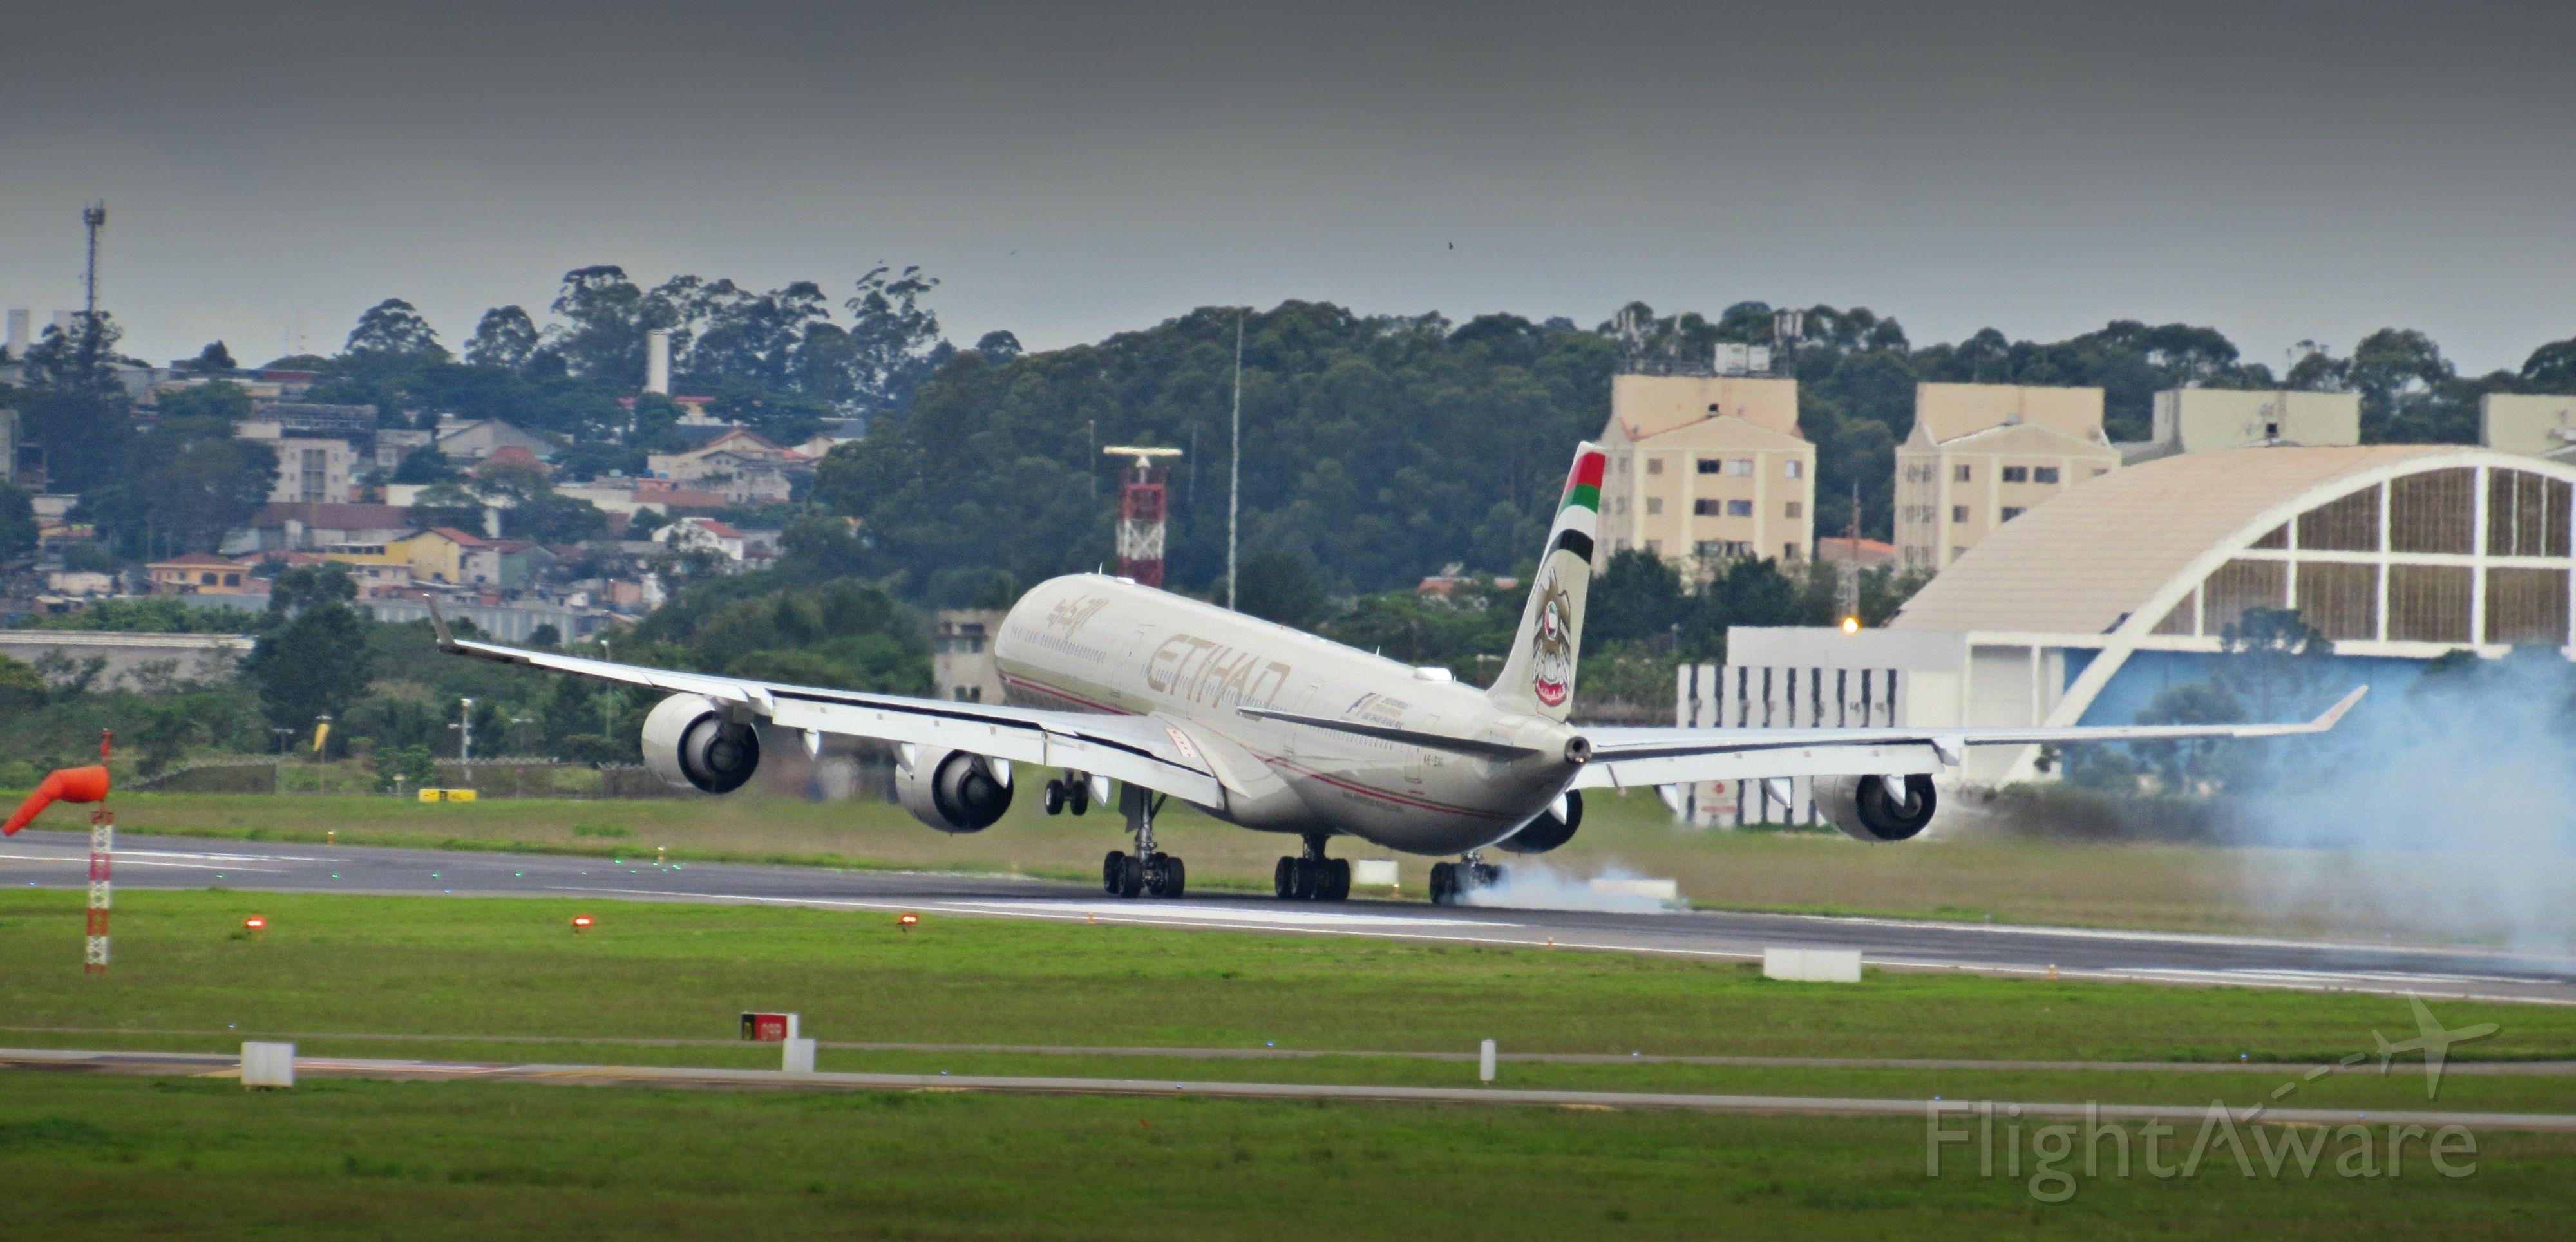 Airbus A340-600 (A6-EHI)